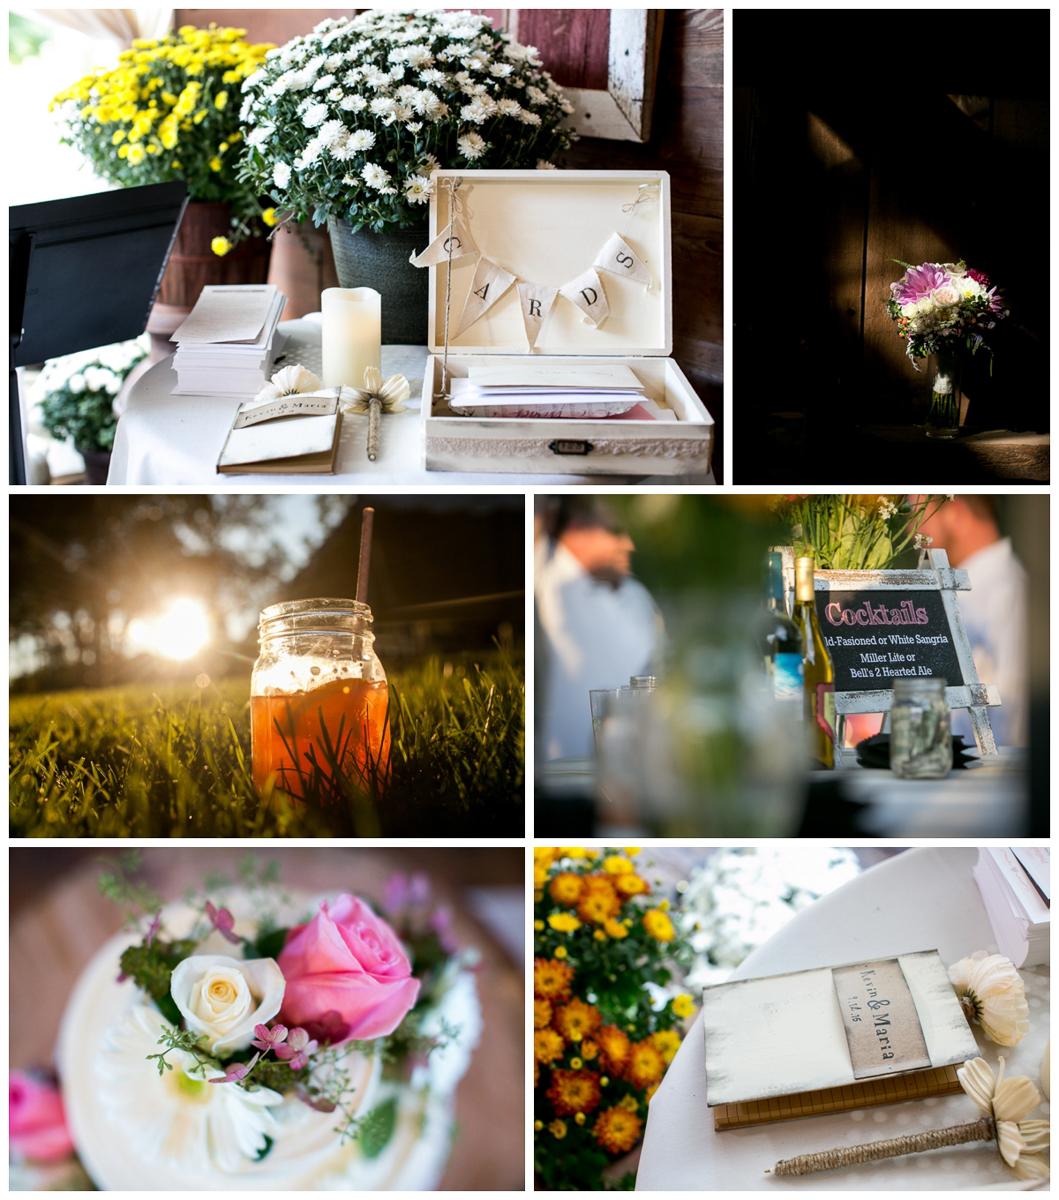 backyard wedding DIY details